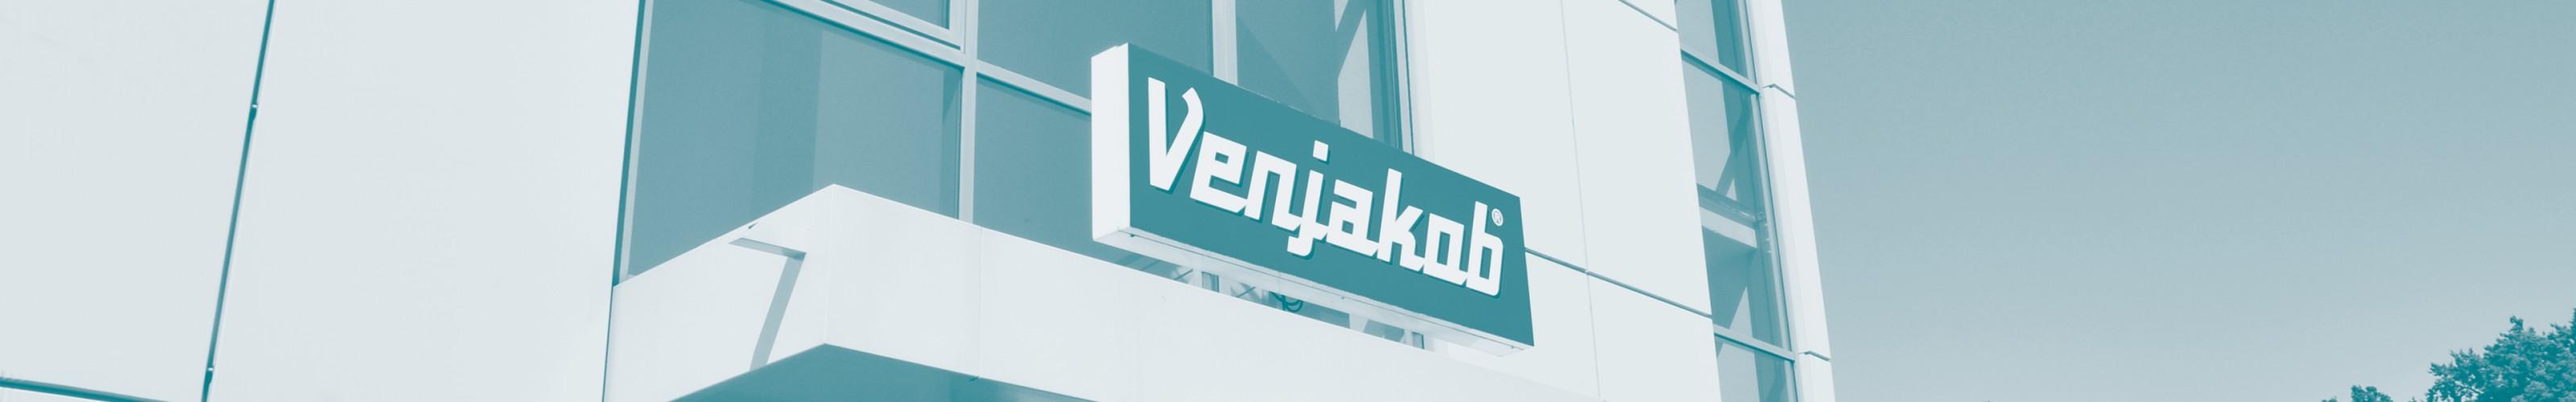 Abbildung Haupteingang Venjakob